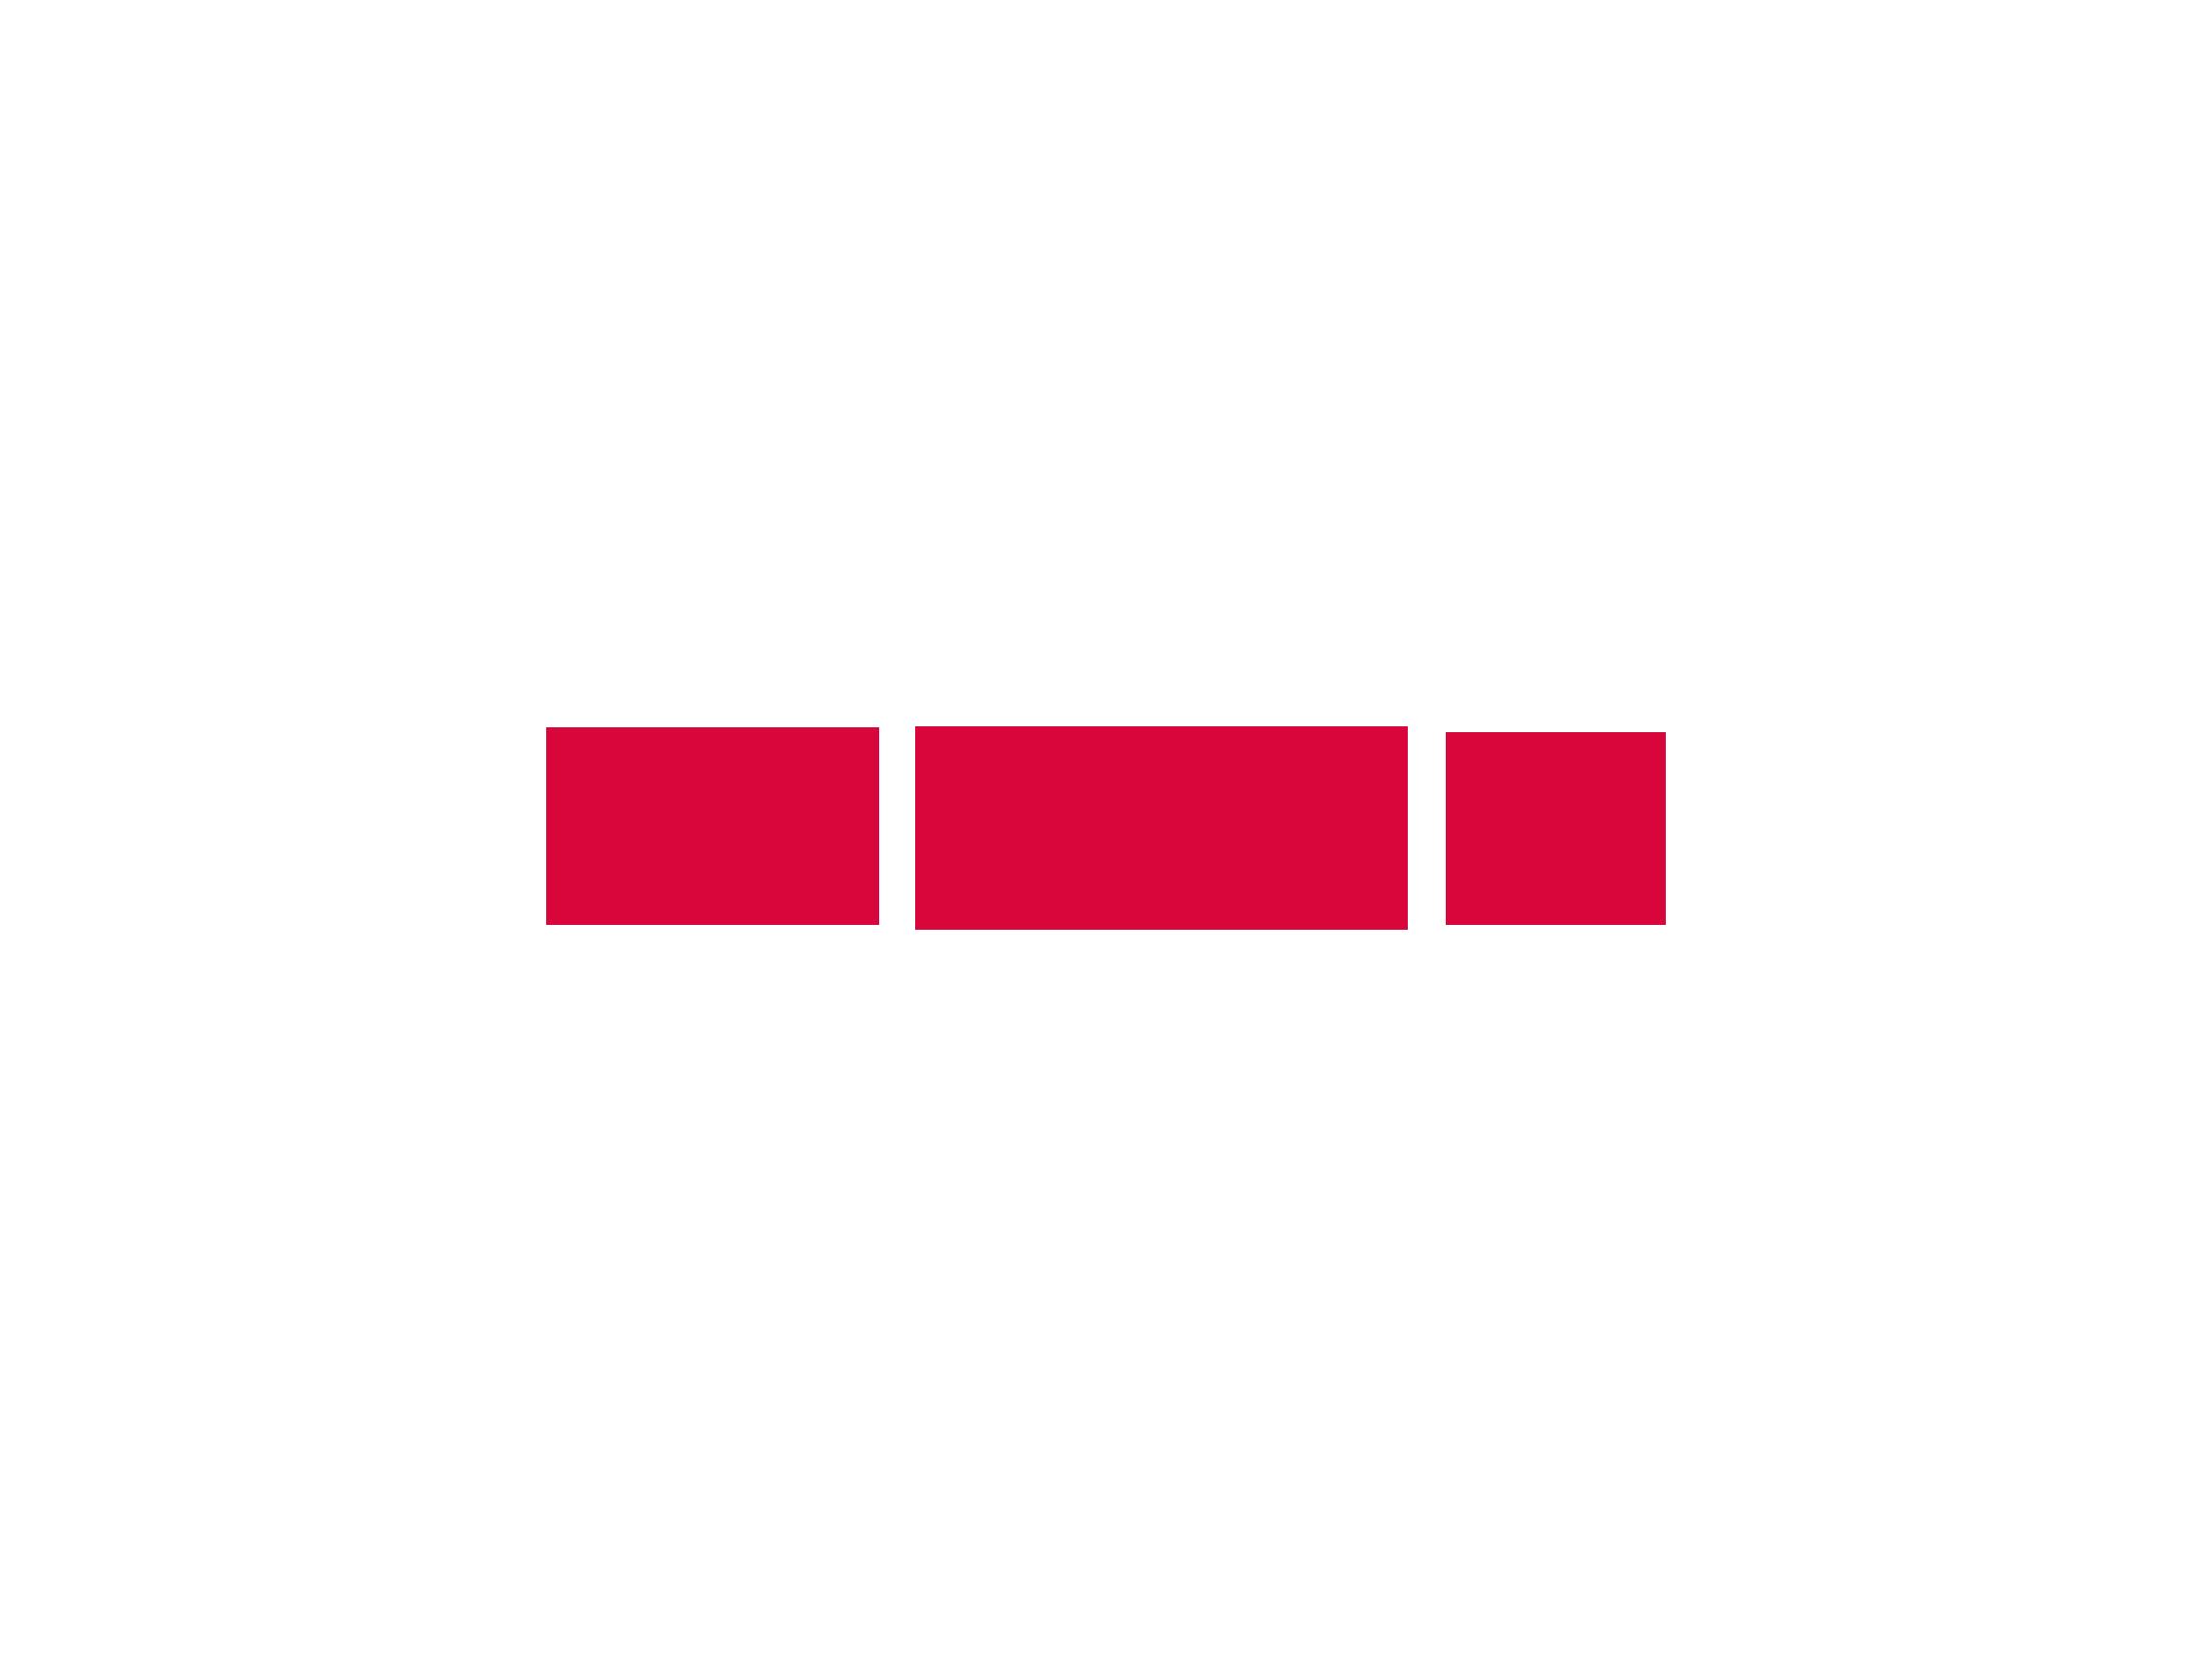 Best 62 Ricoh Backgrounds on HipWallpaper Ricoh Backgrounds 2272x1704